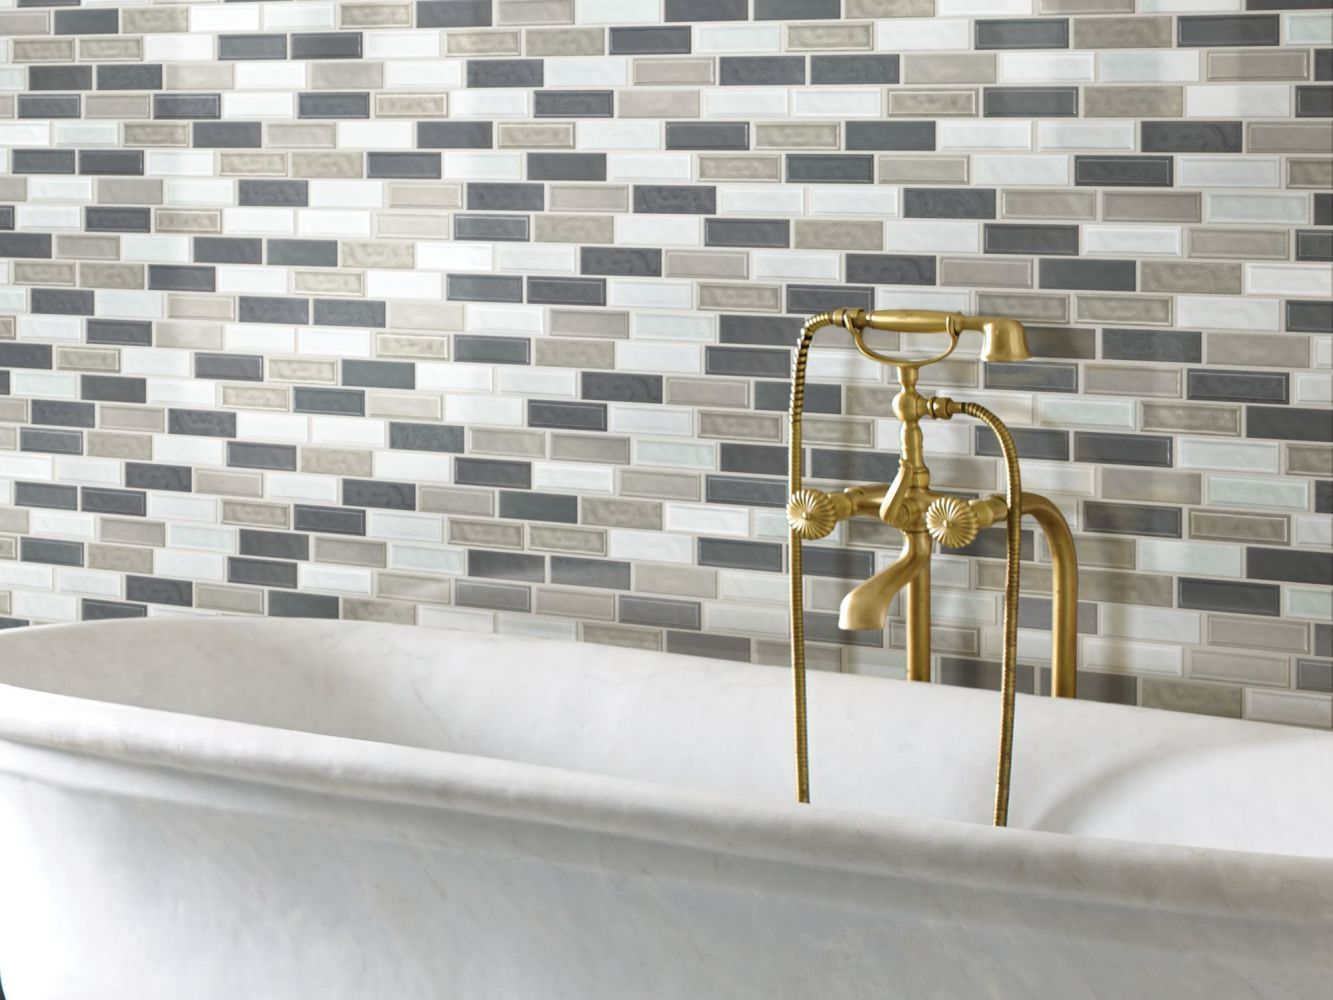 Shaw Floors Home Fn Gold Ceramic Geoscapes Random Linear Warm Blend 00520_TG45C